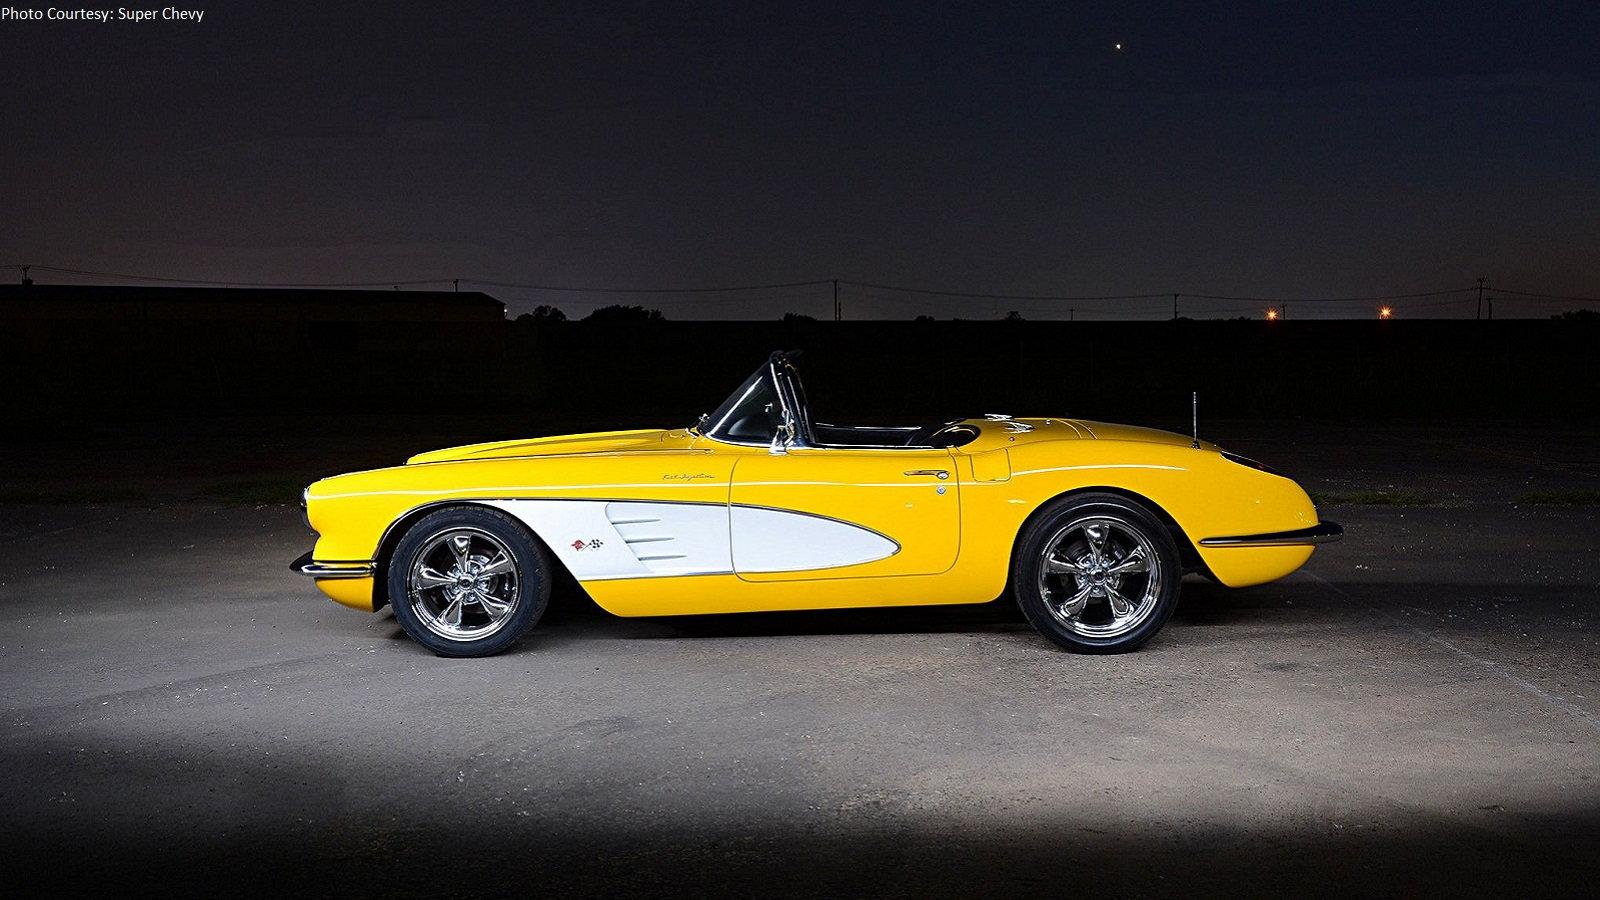 Velocity Yellow C1 Corvette Is Impossible to Ignore